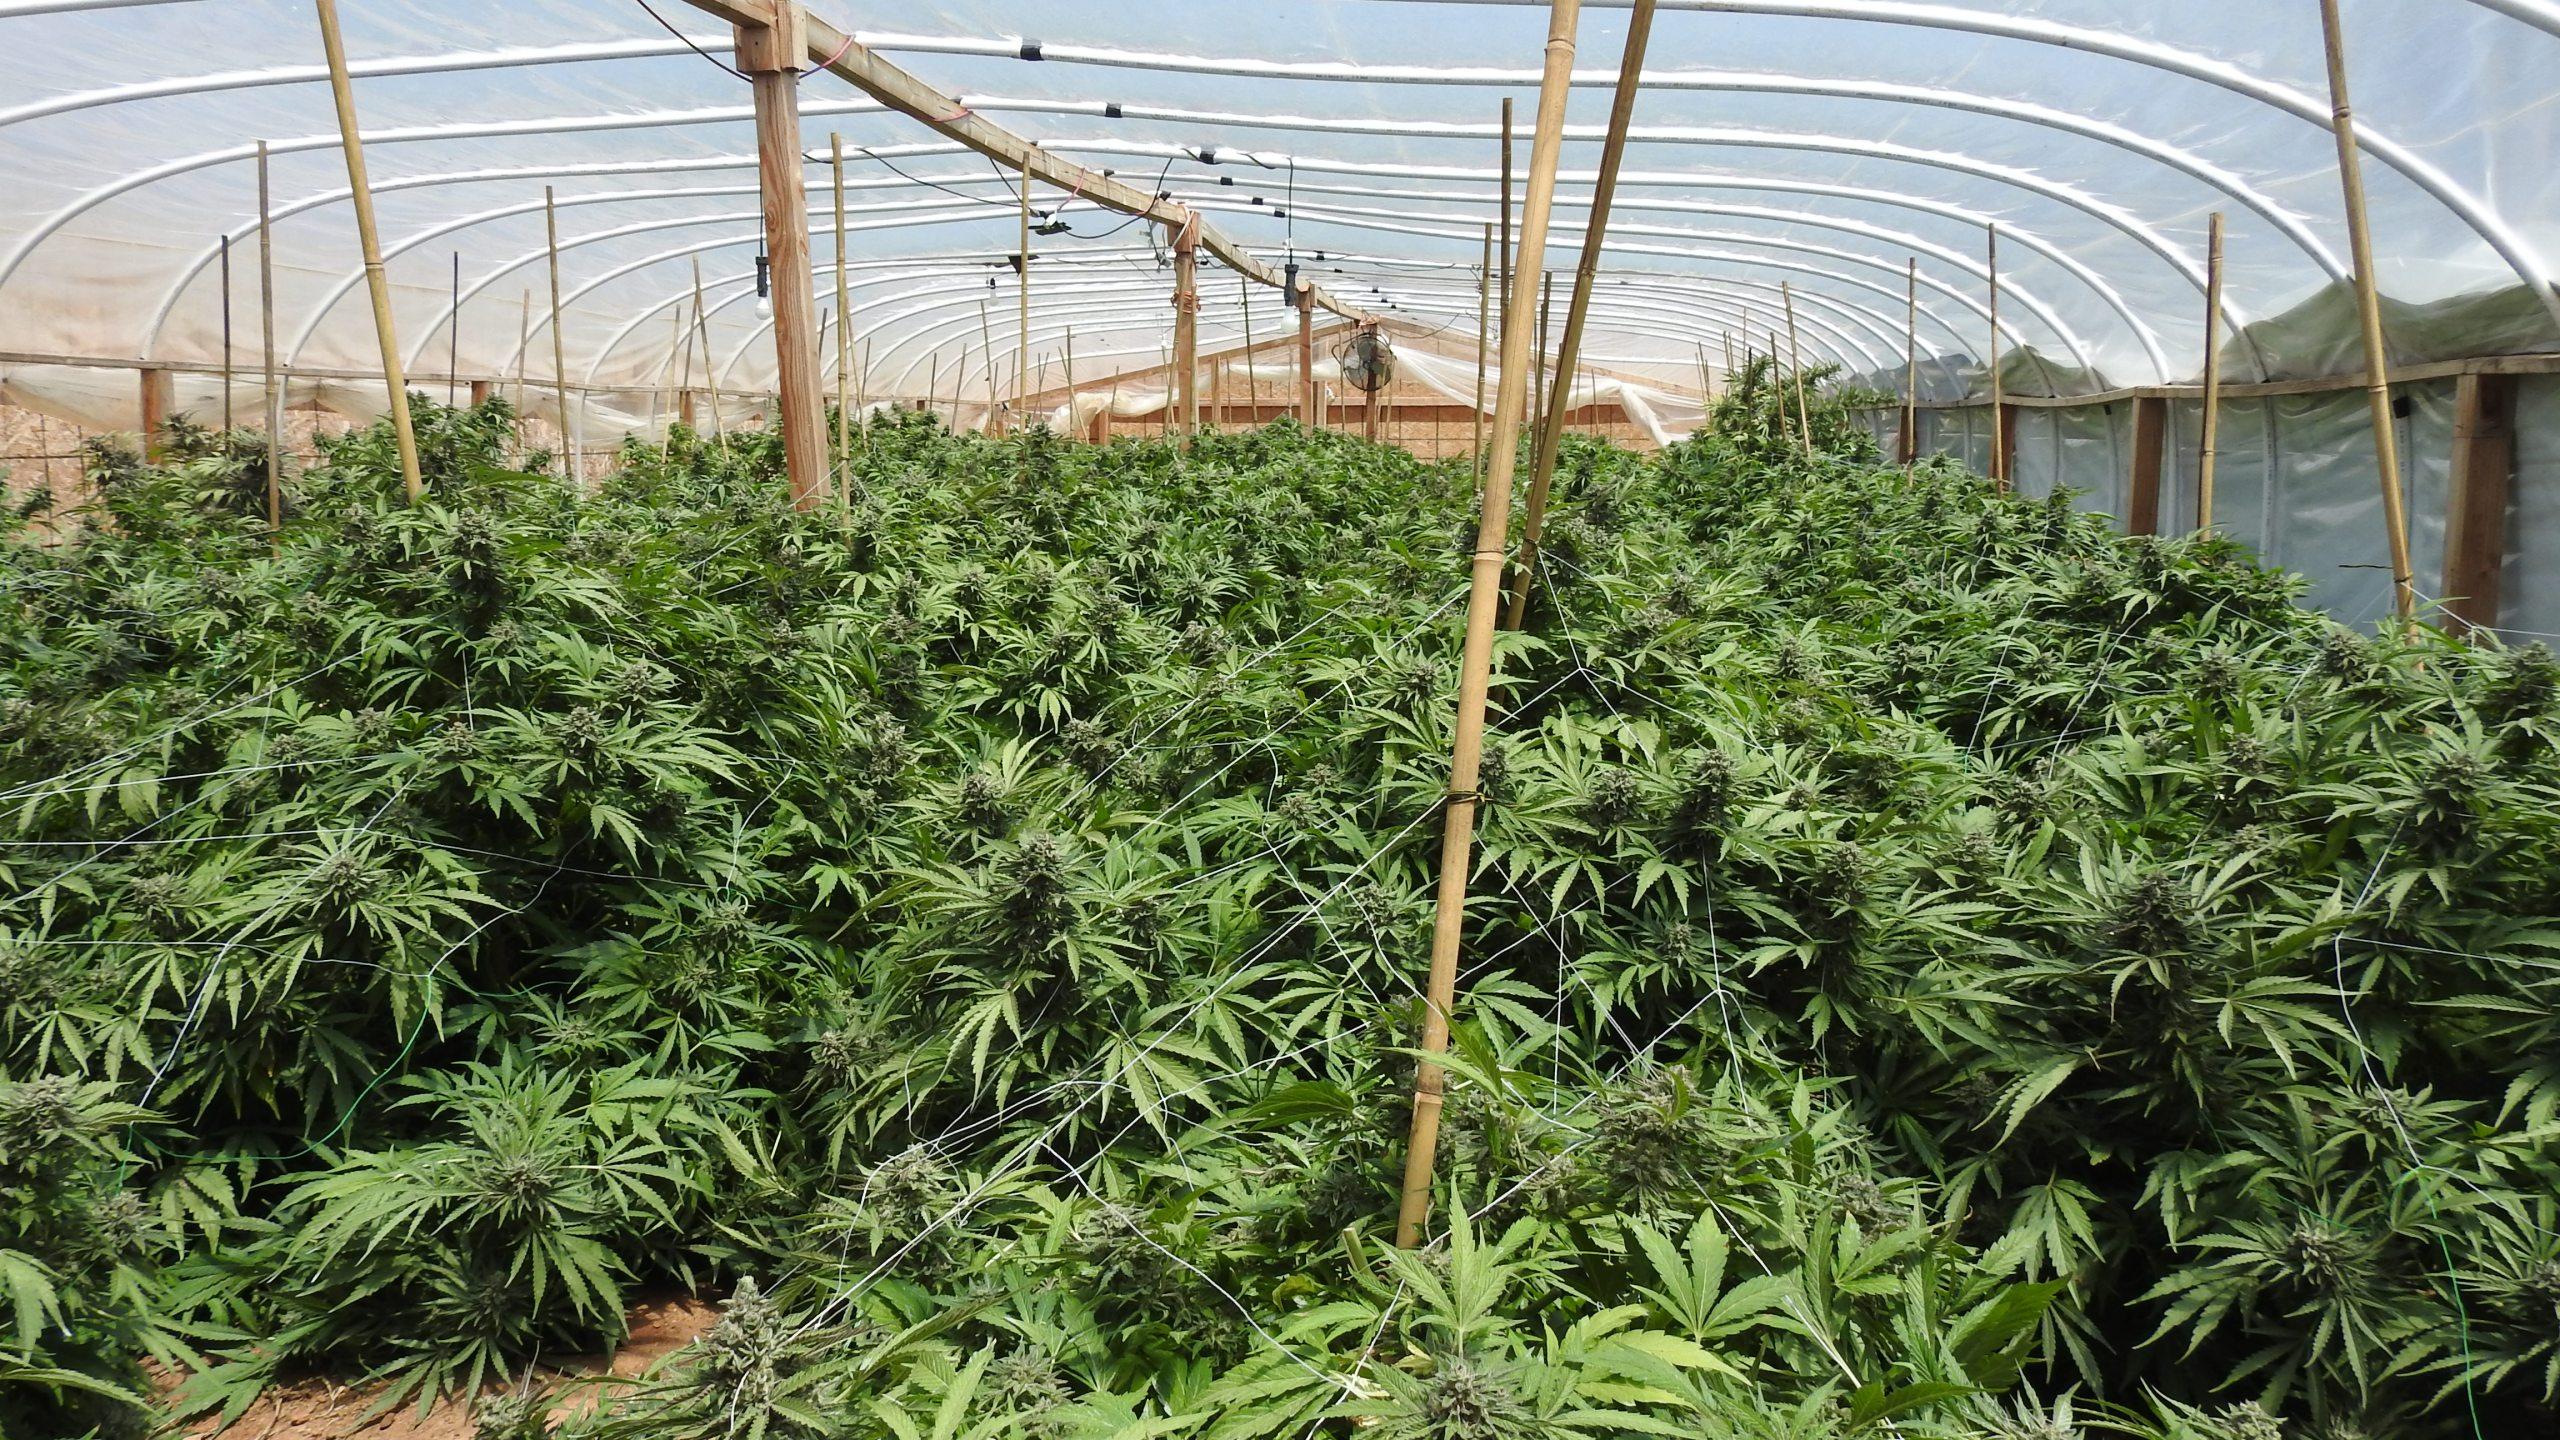 Major marijuana crackdown secures 3,000 pounds of pot, 37 arrests in Fresno County